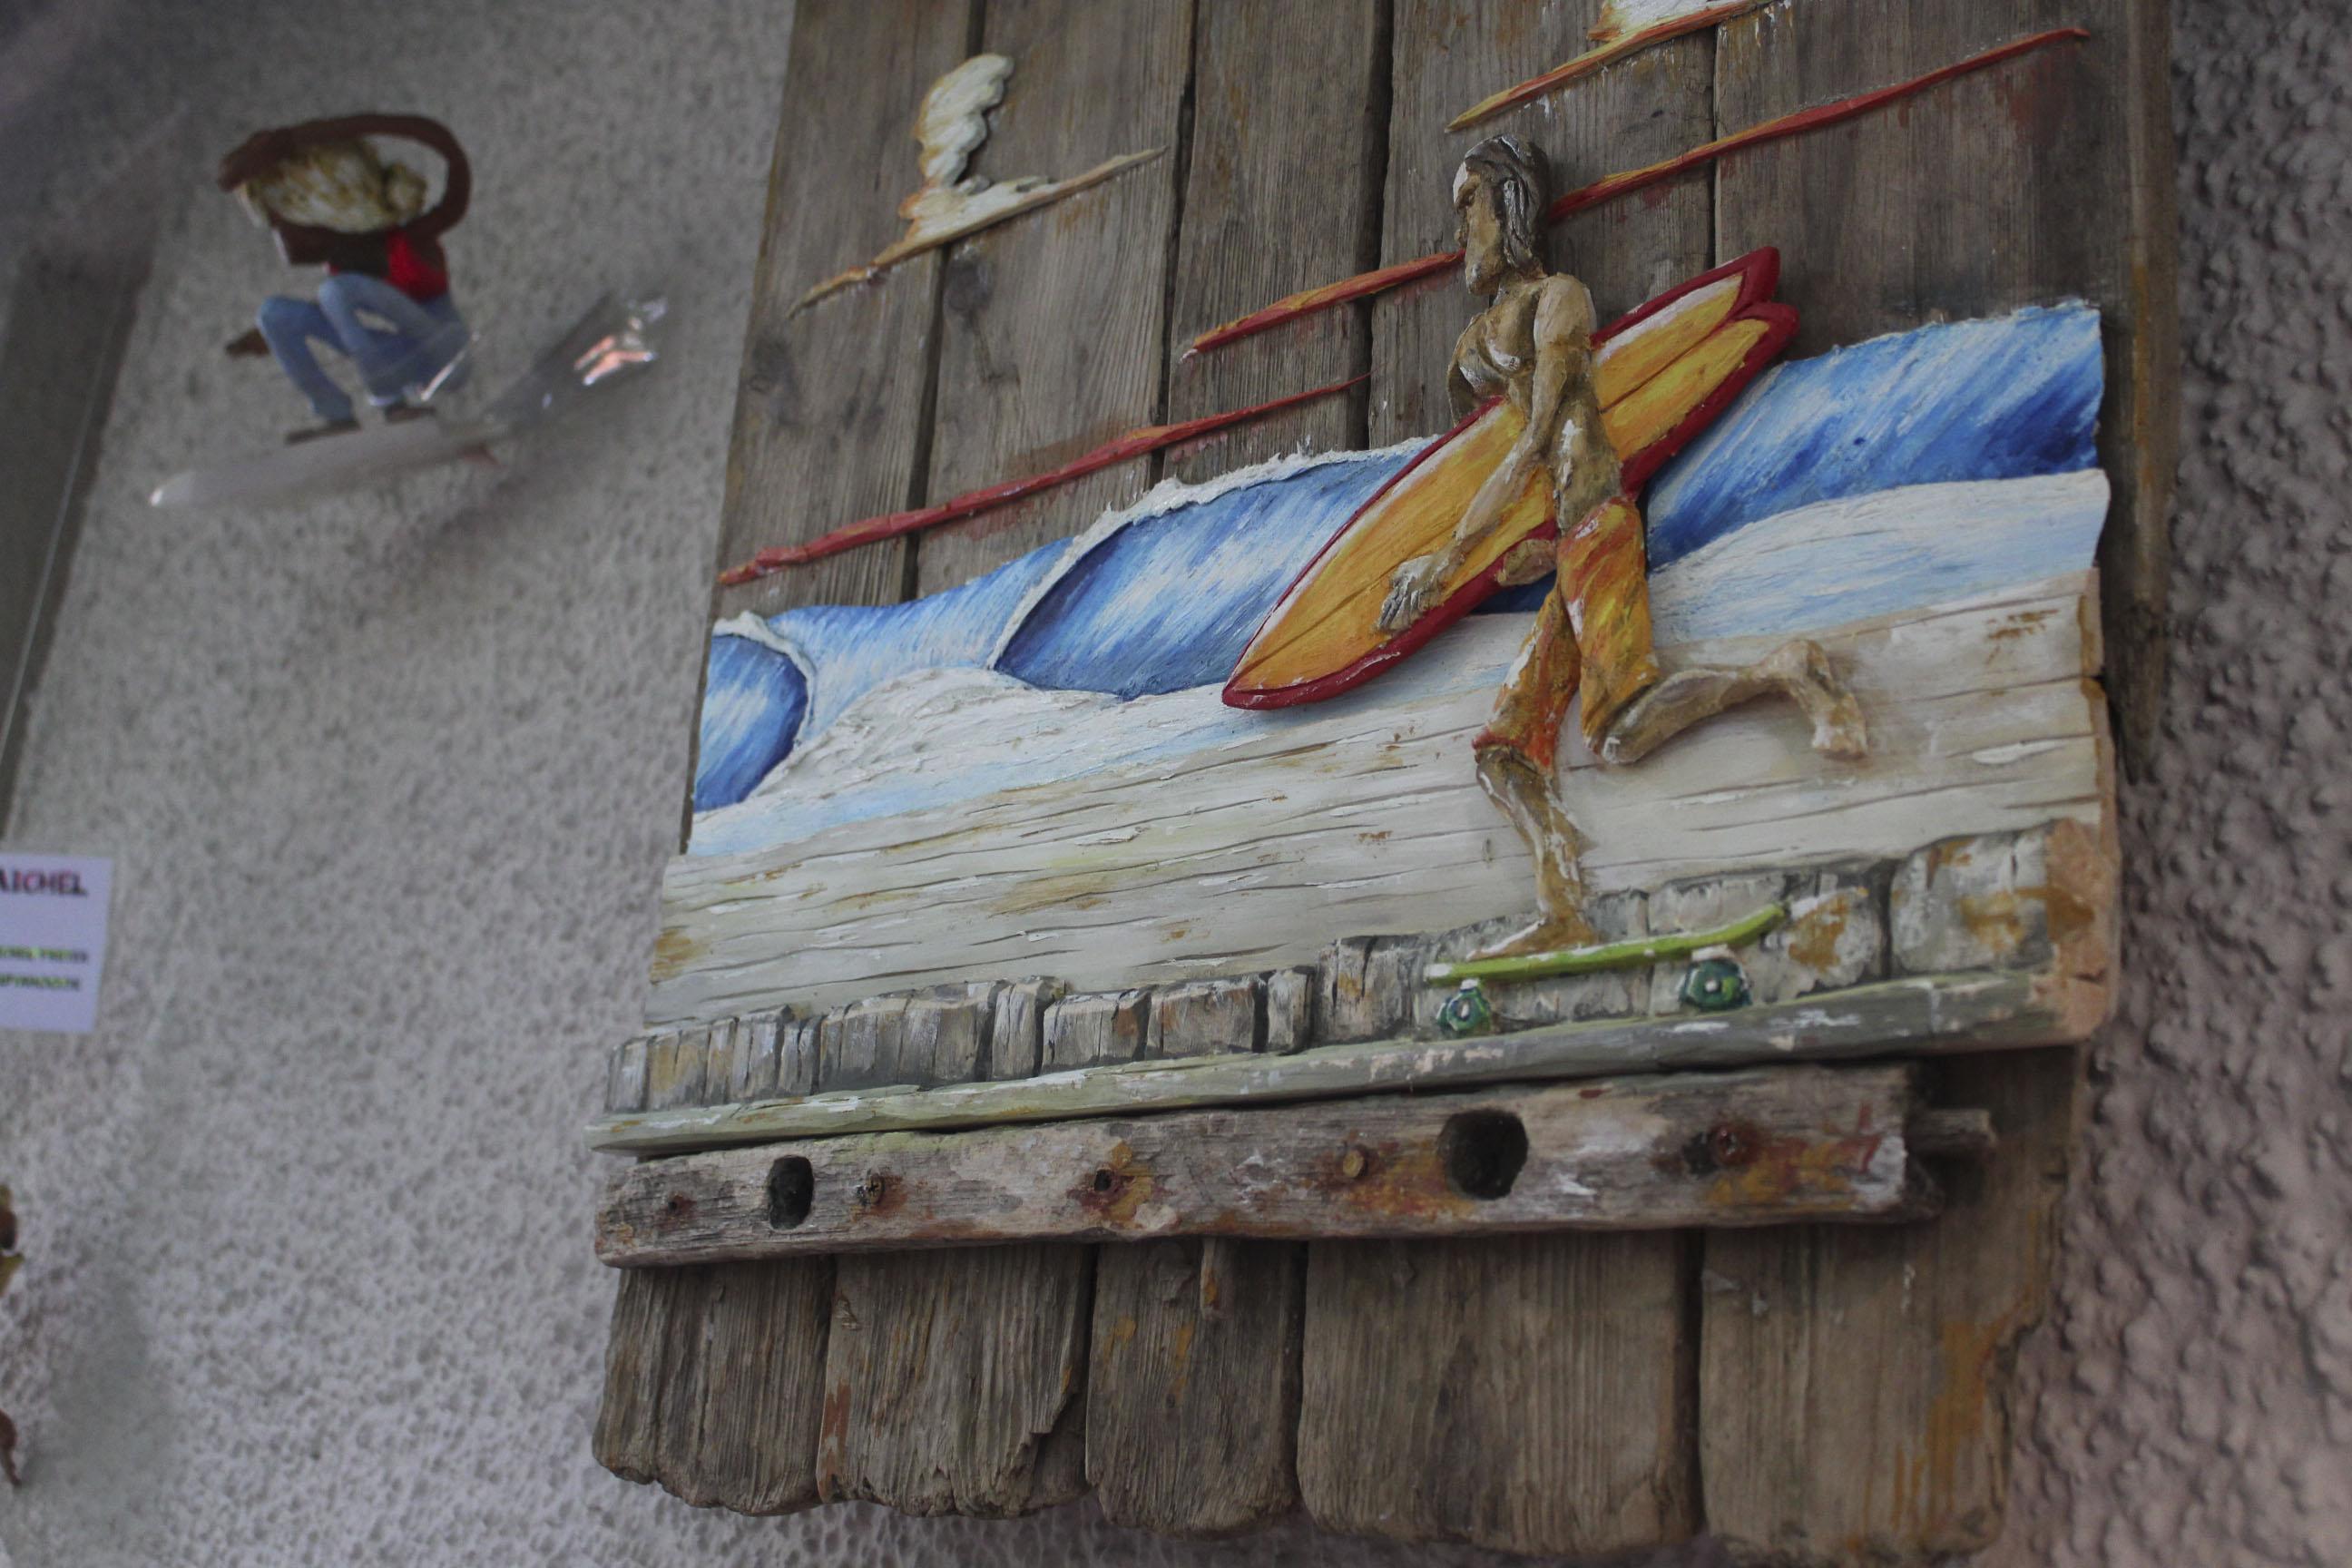 Surf & Skate Festival Munich Art by Karo Holeksa